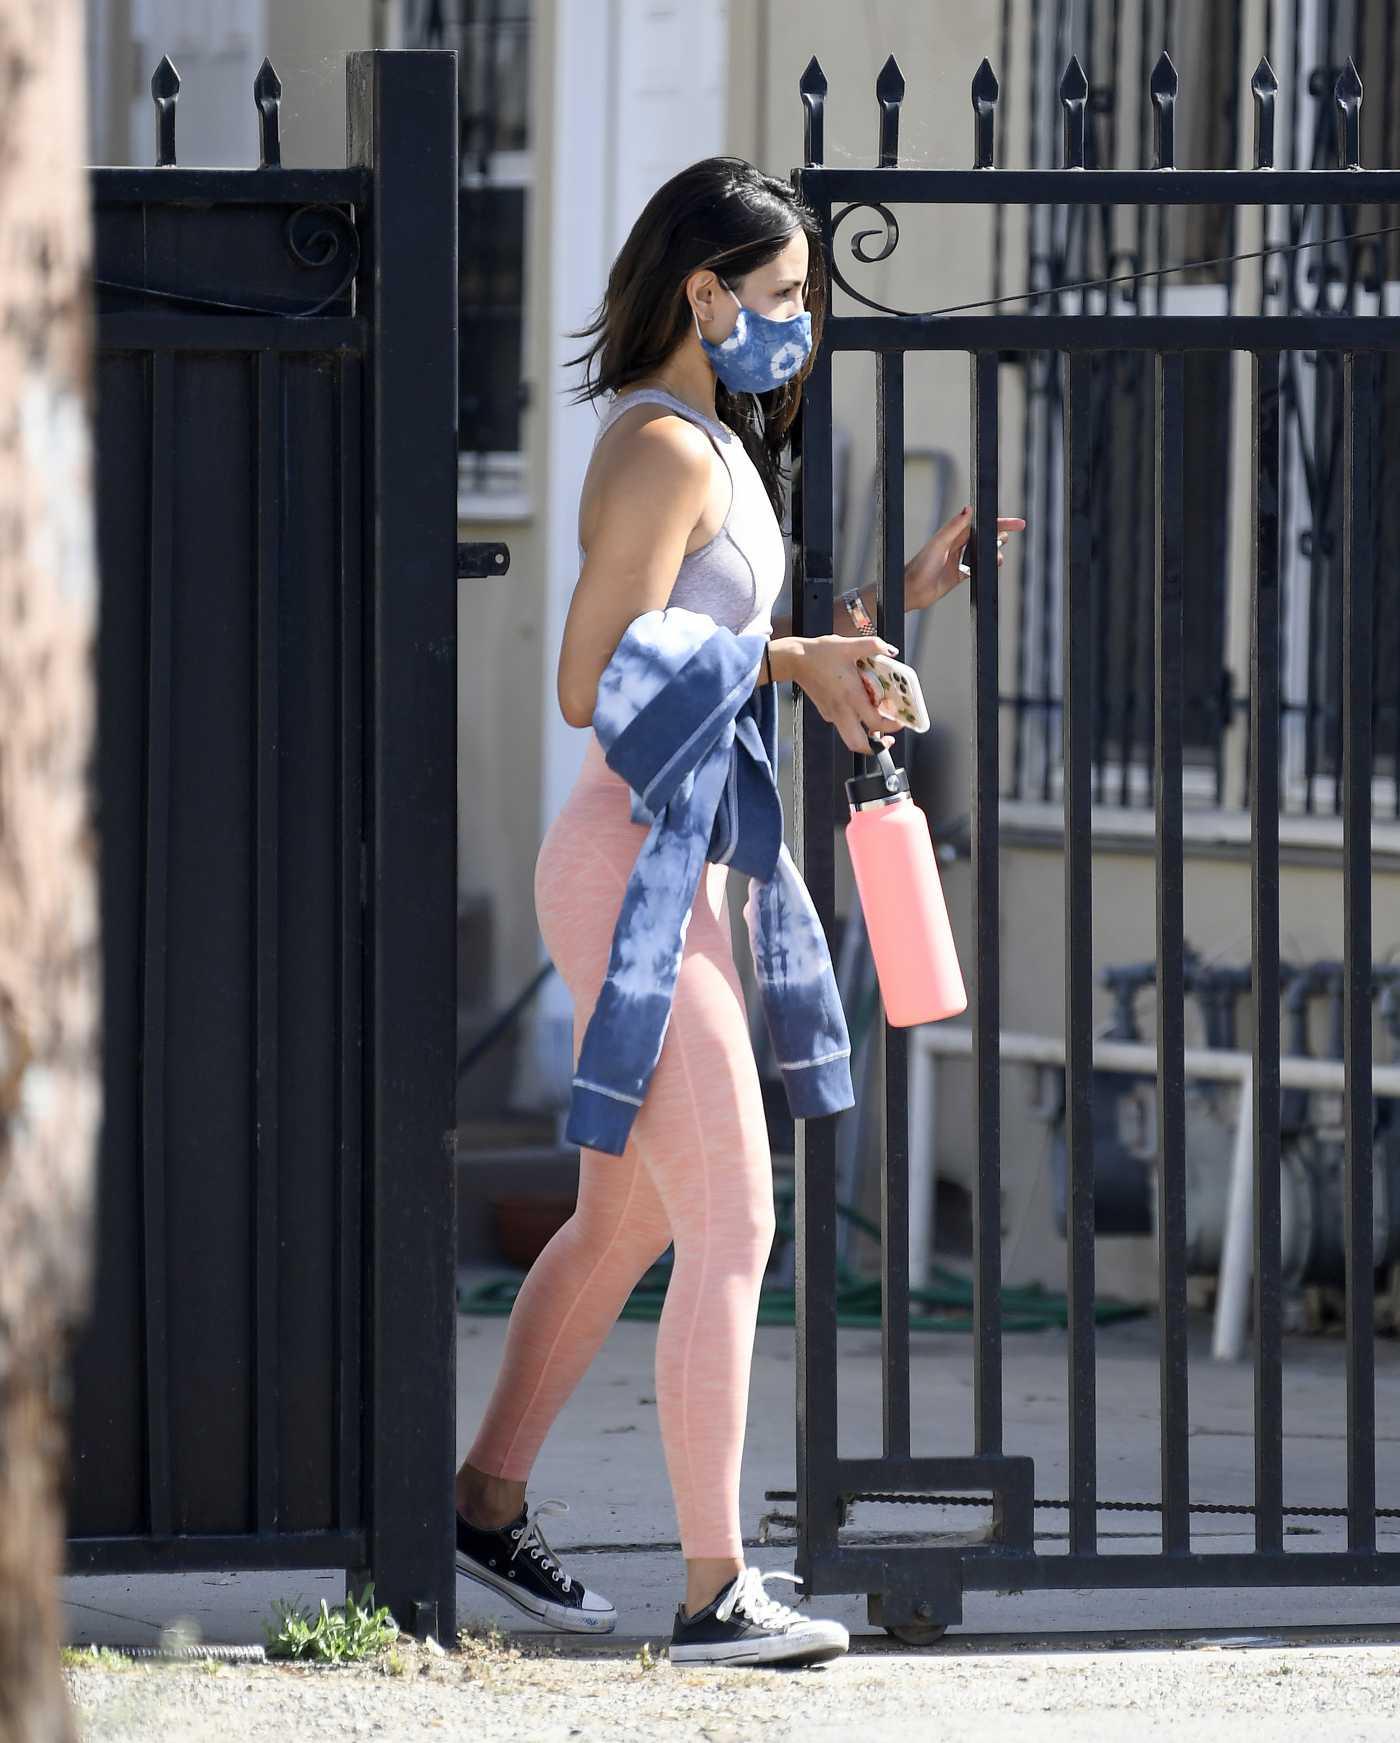 Eiza Gonzalez in a Pink Leggings Was Seen Out in Los Angeles 05/31/2020